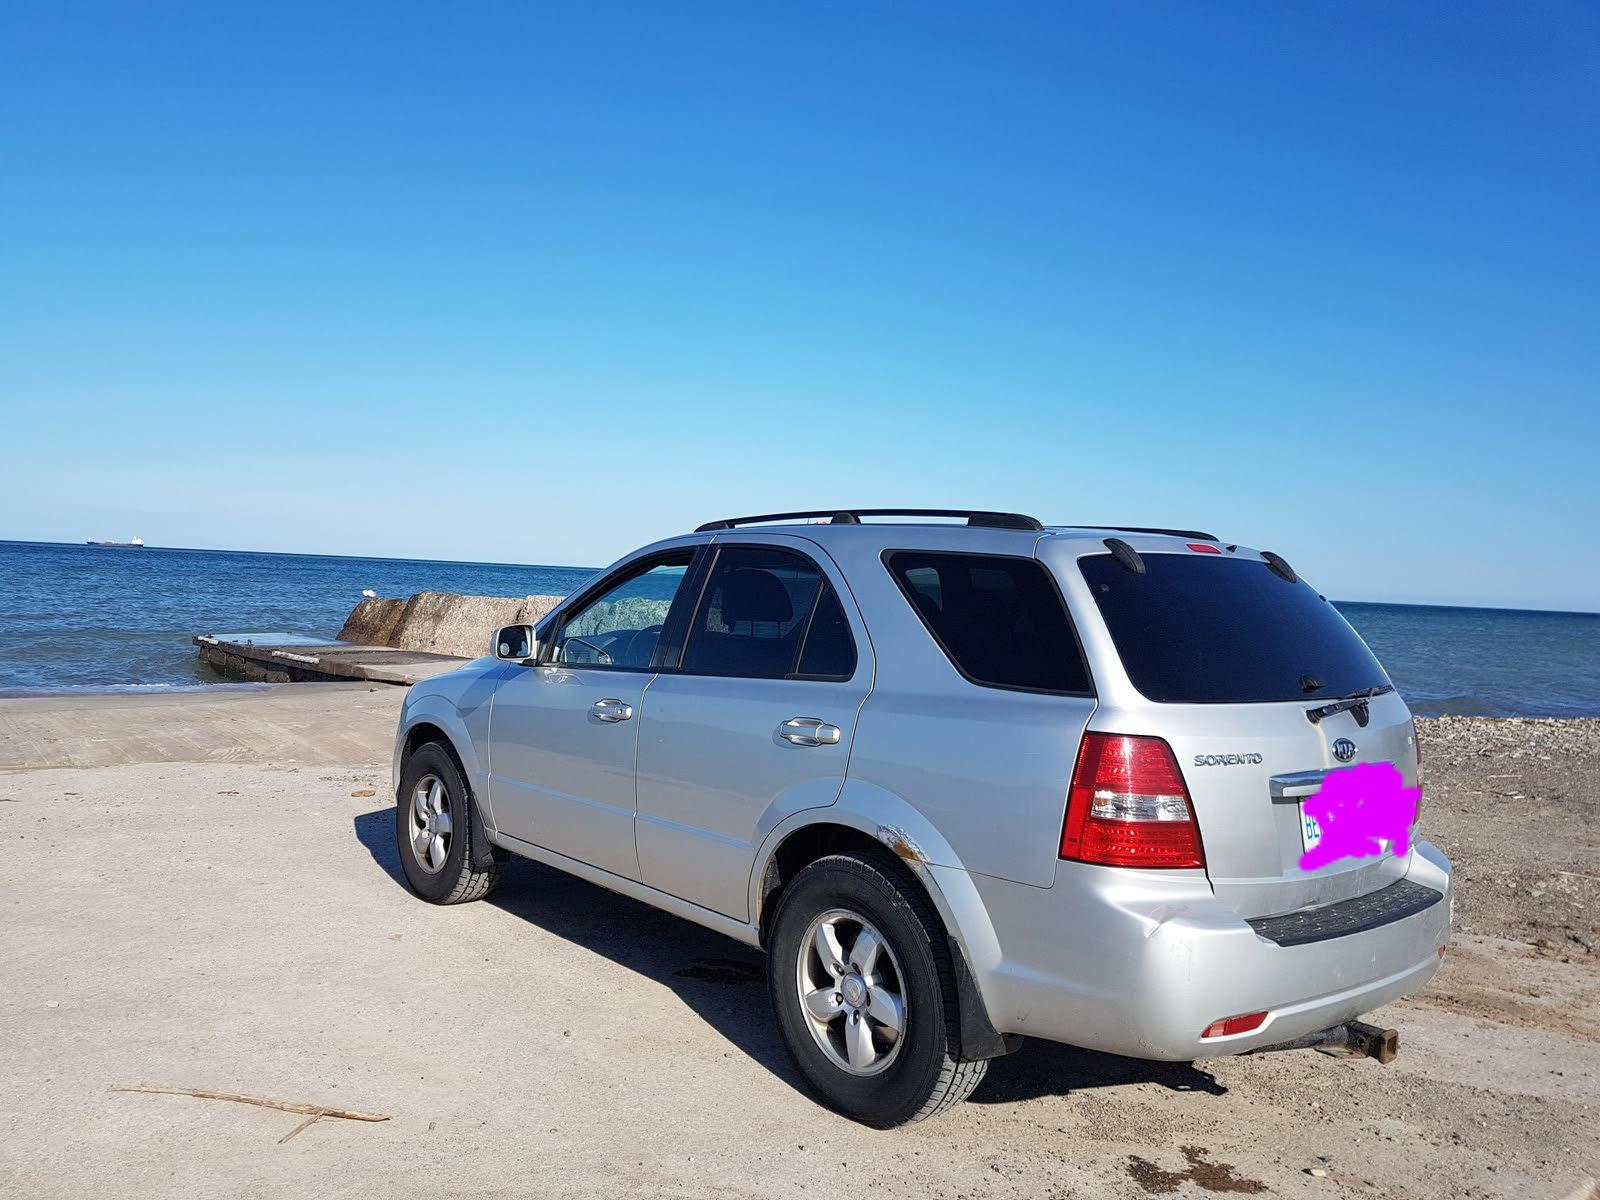 Ford Explorer 2017 Interior Lights Wont Turn Off